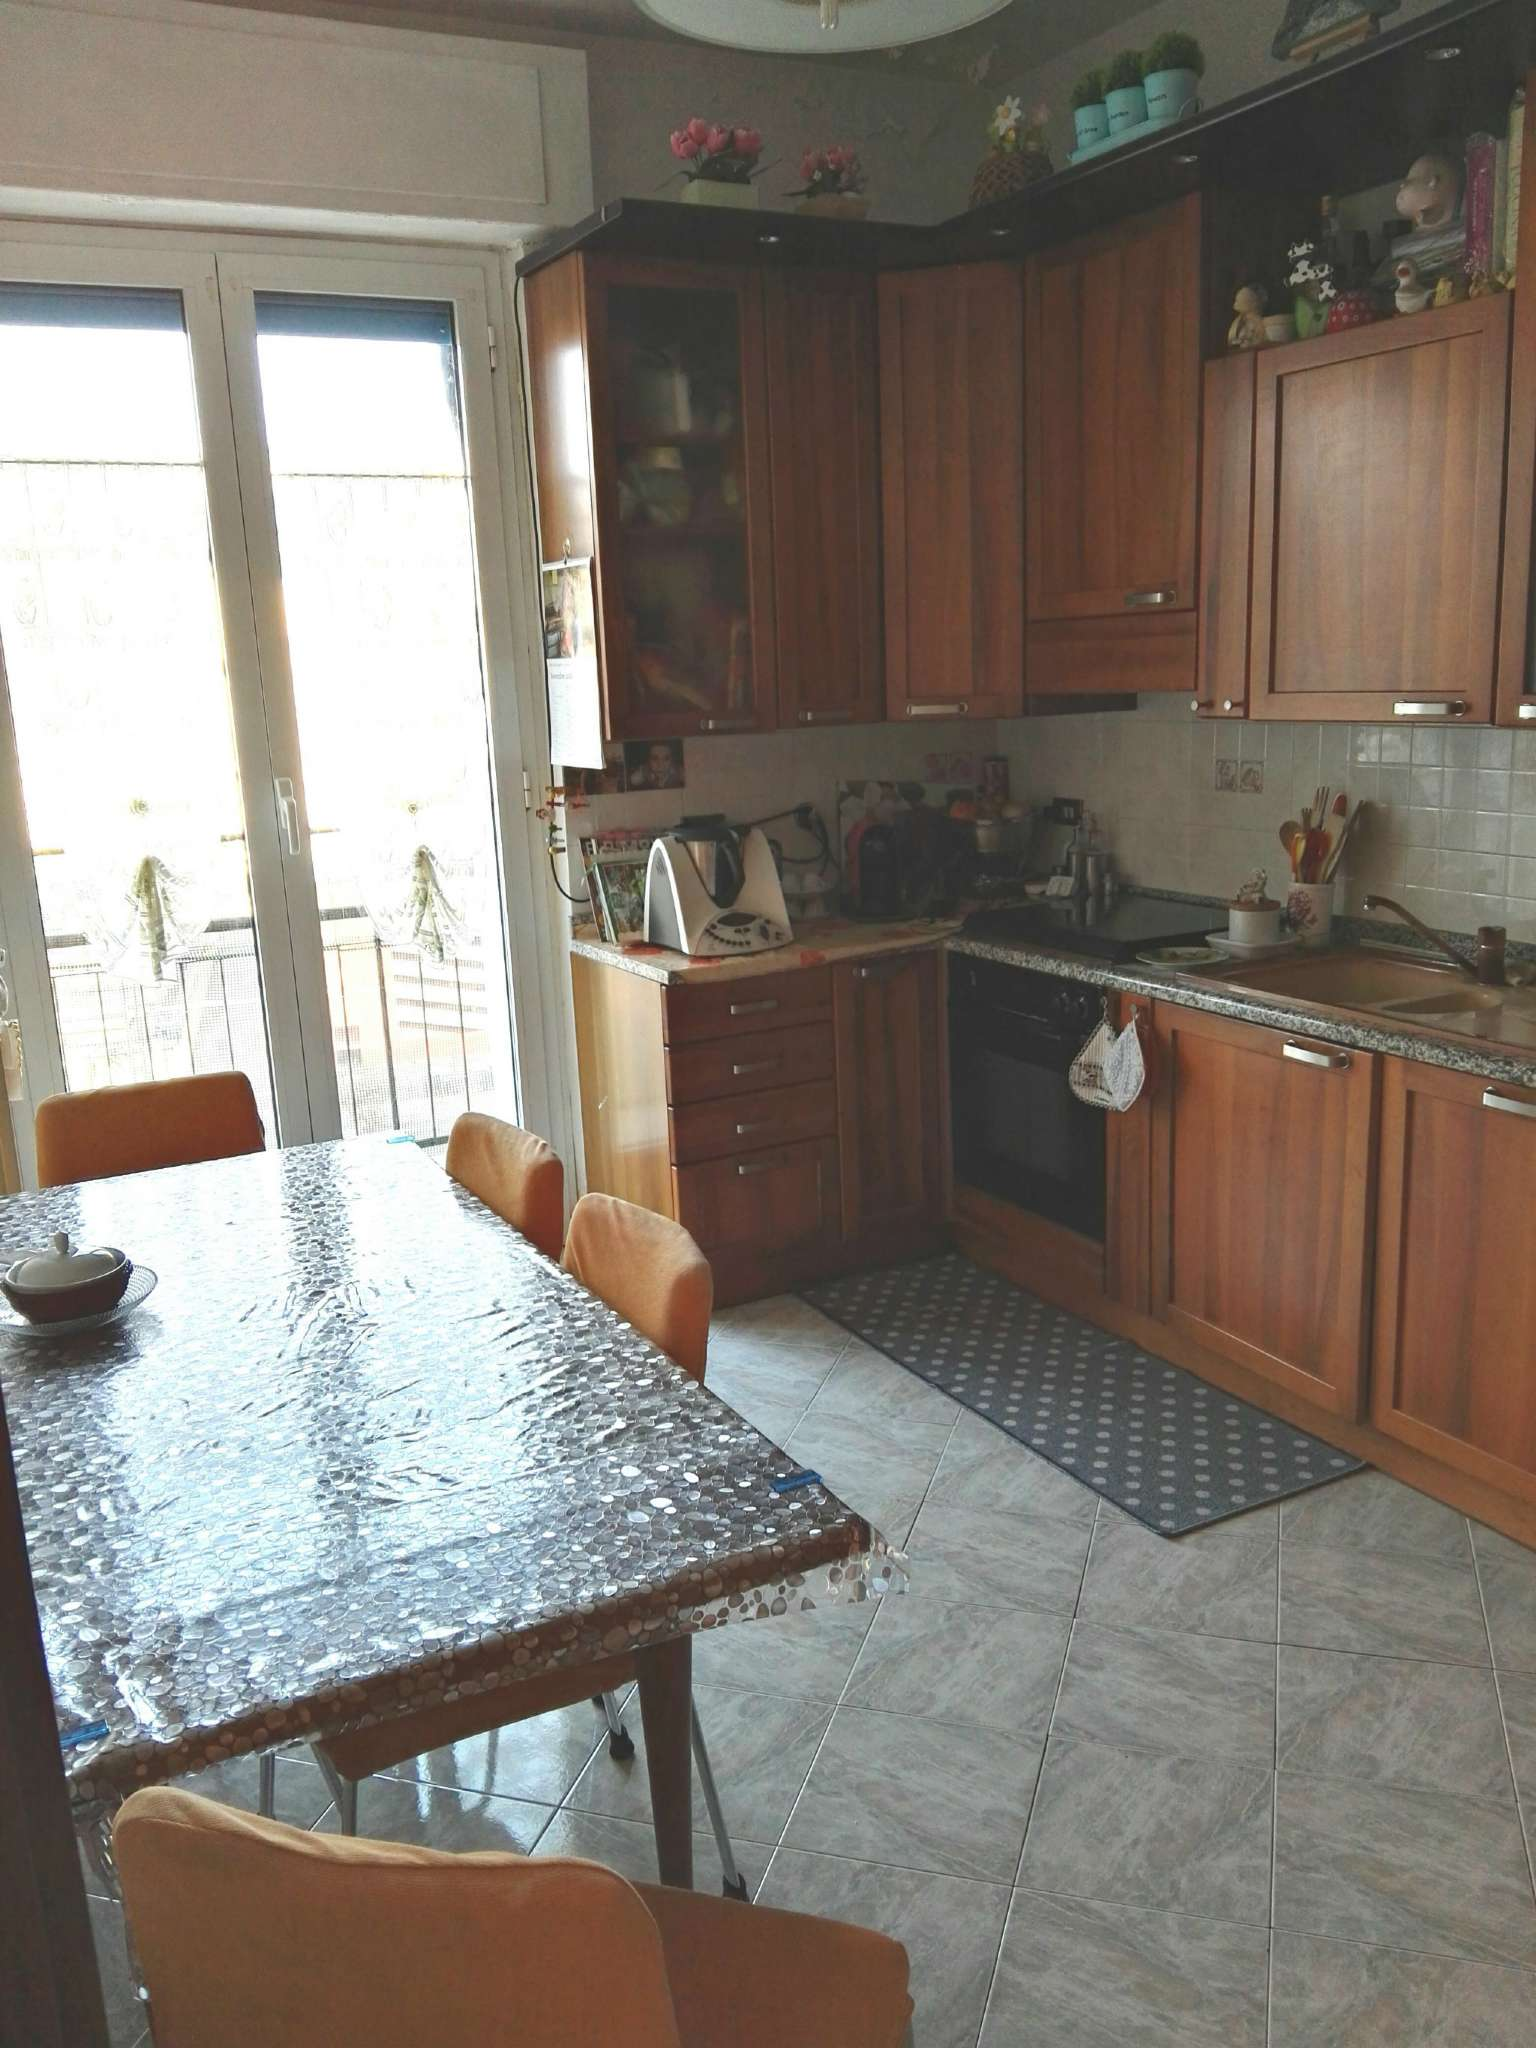 Appartamento genova vendita 95000 euro 70 mq 16 11 2016 for Cucina 9 genova